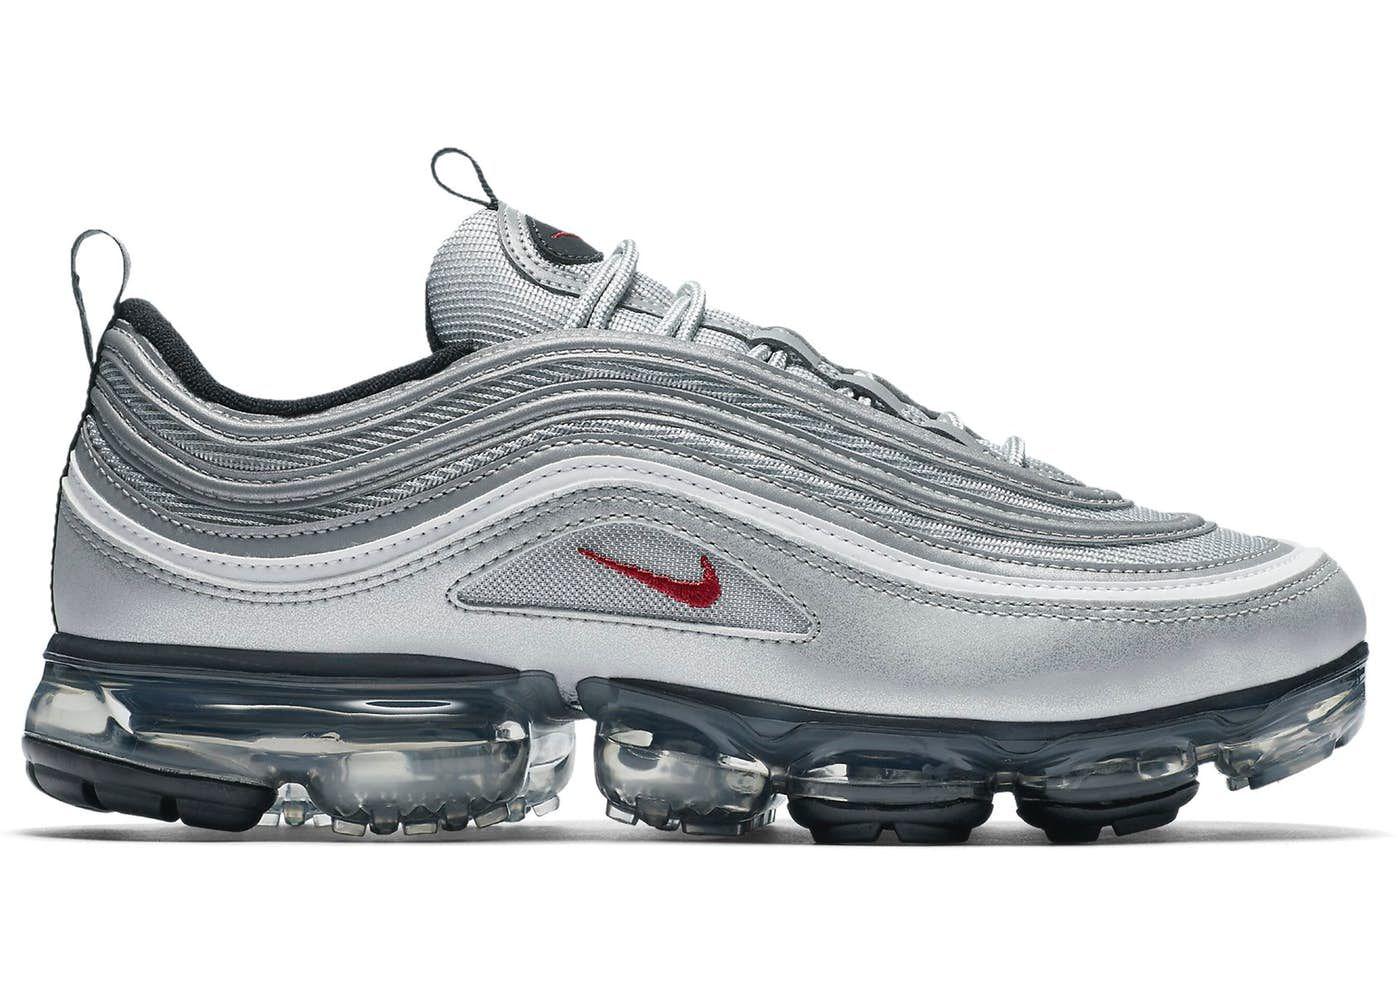 Nike VaporMax 97 Silver Bullet | Nike, Sneakers nike, Nike